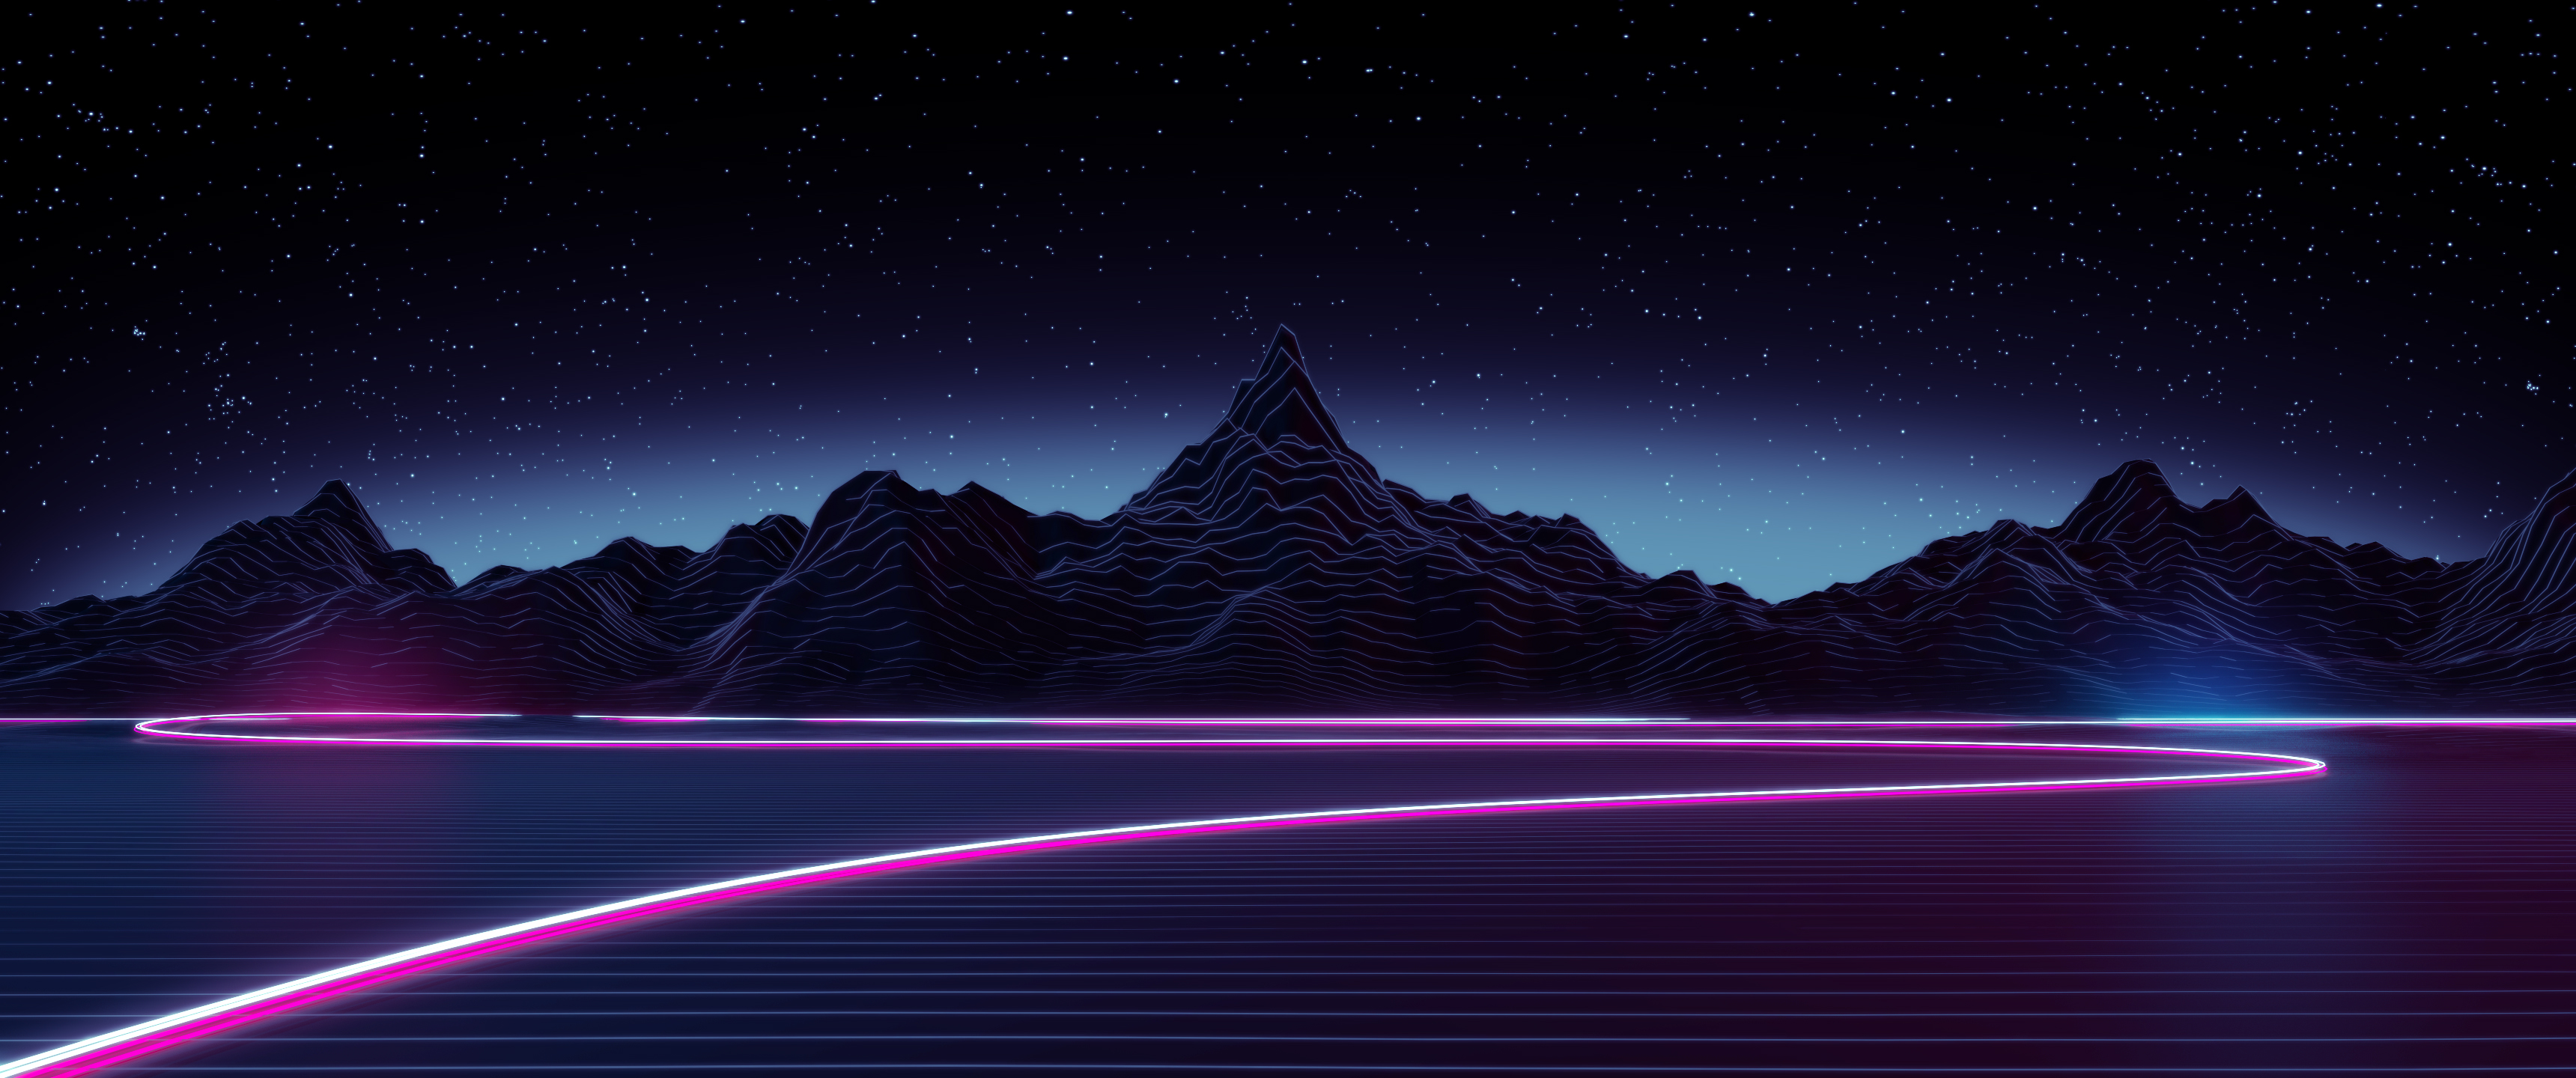 Fantastic Wallpaper Mountain Aesthetic - highway_by_axiomdesign-d9em9fs  HD_94241.jpg